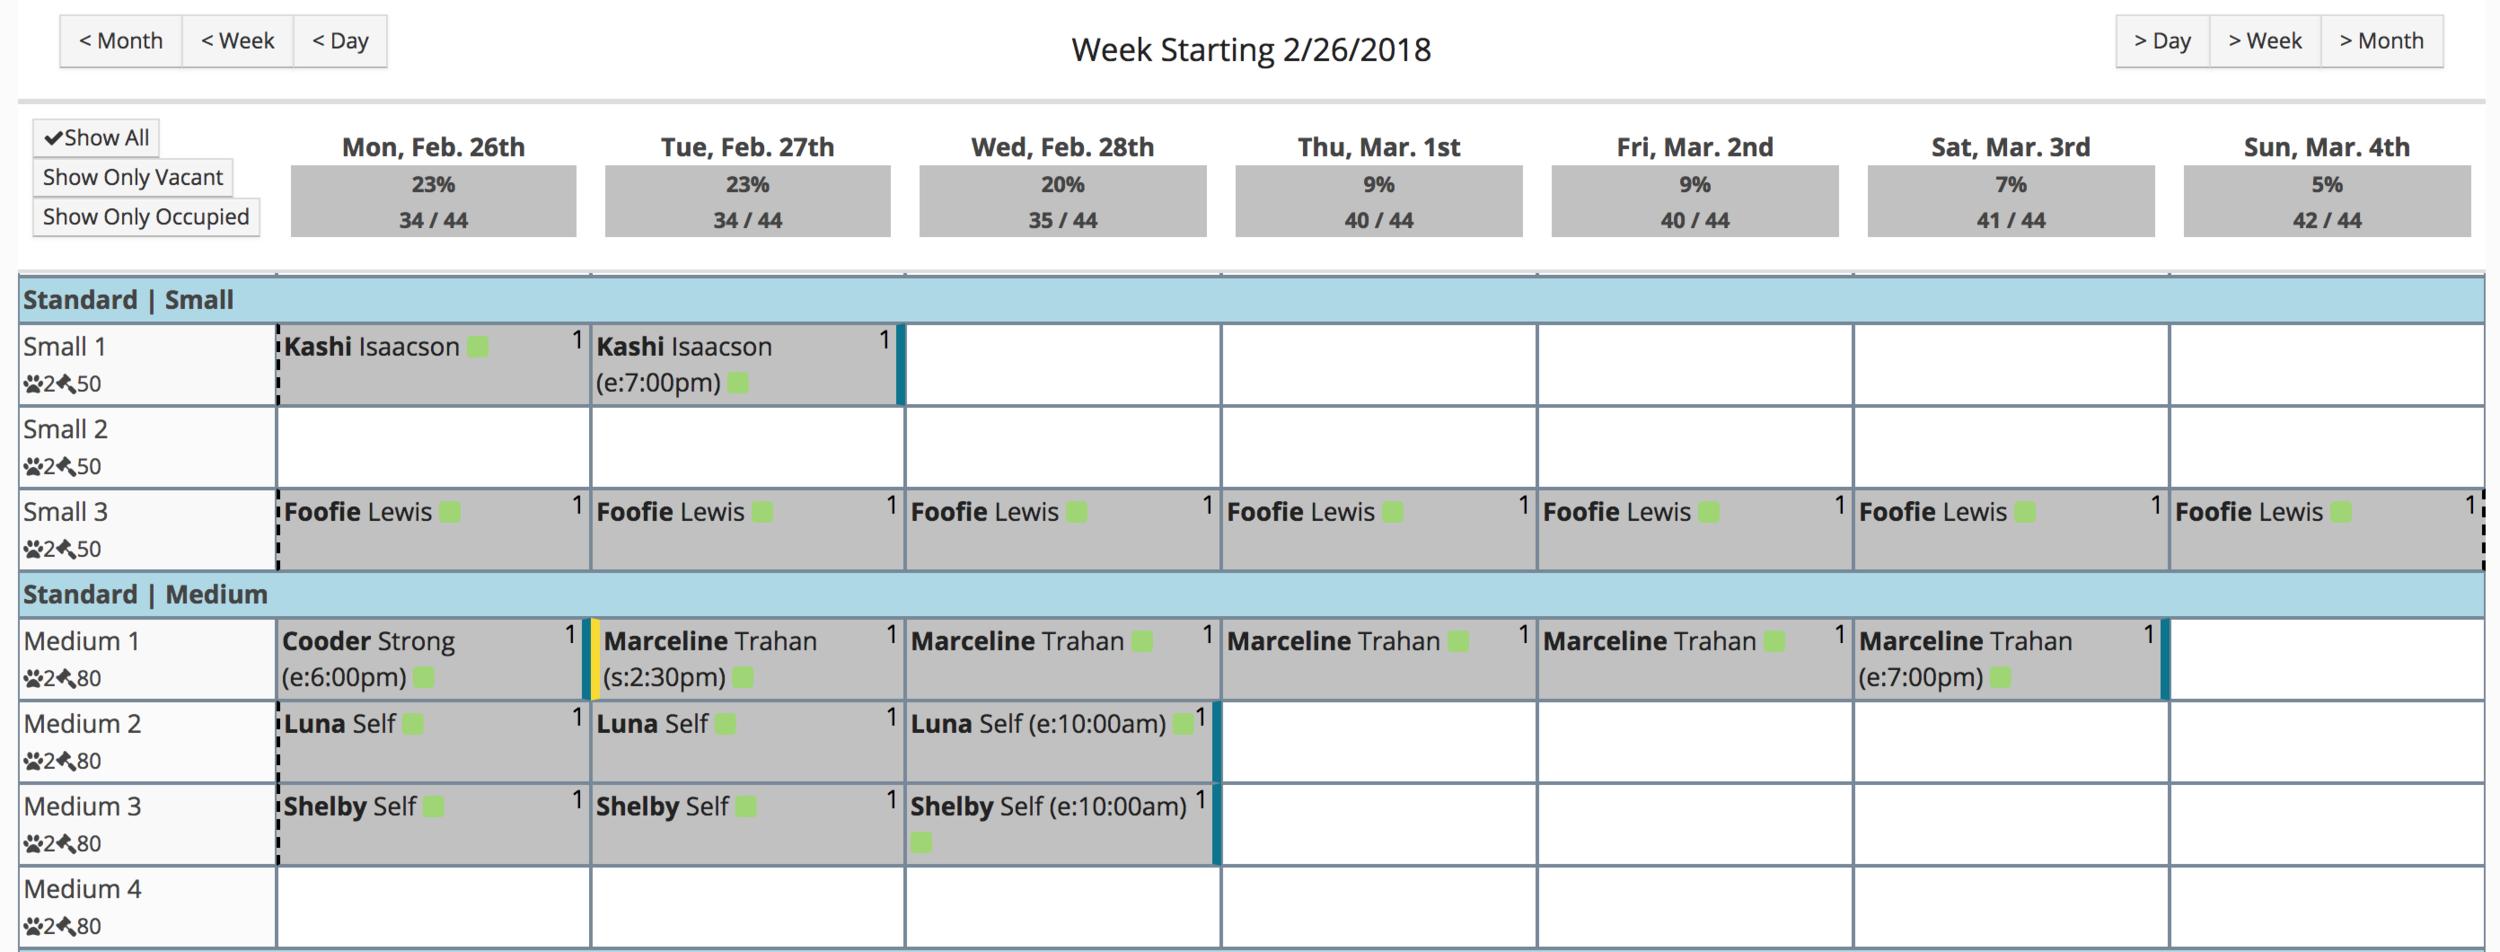 gingr pet reservation boarding app lodging kennel run calendar